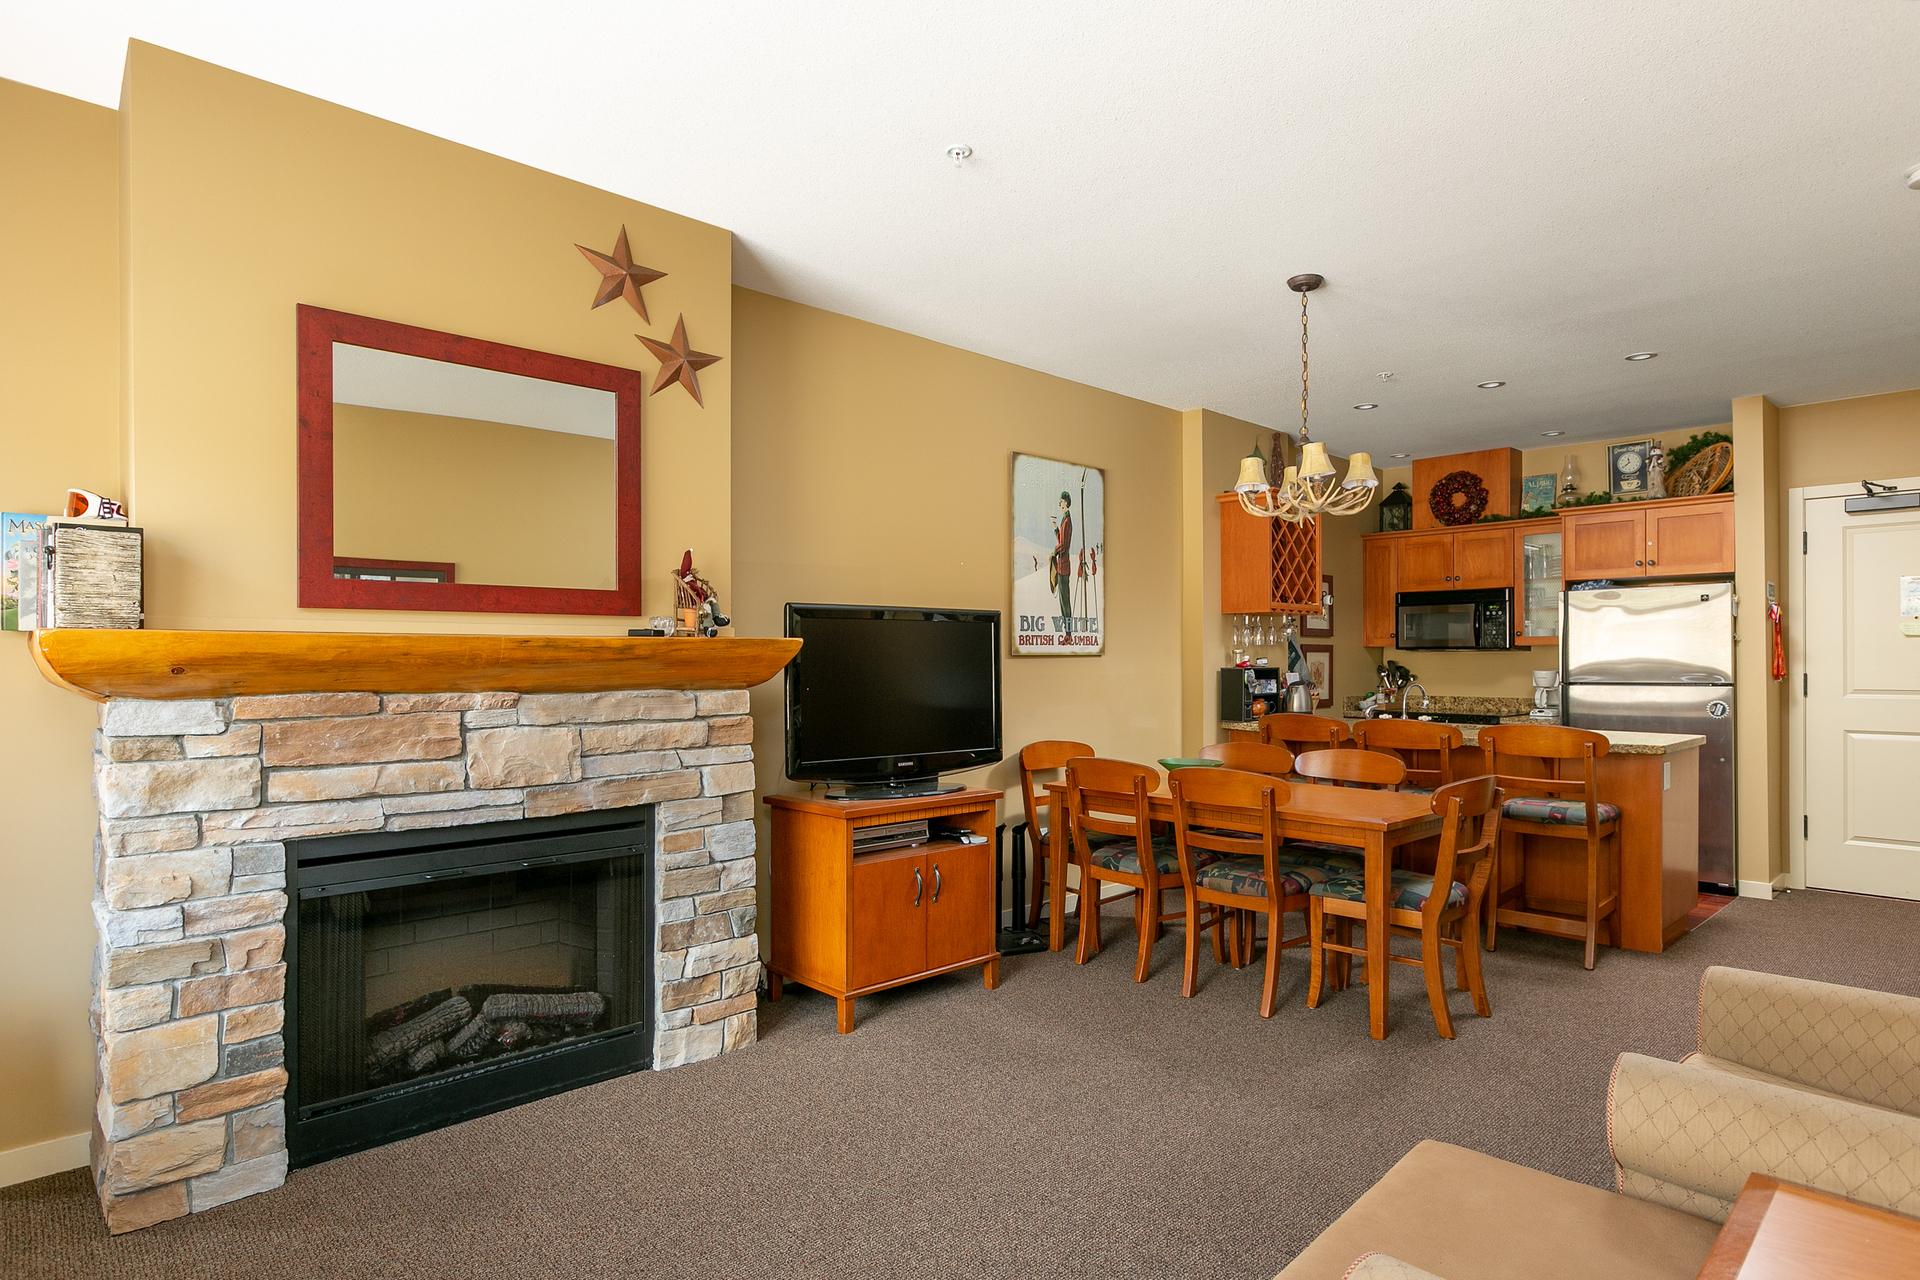 5d3_4076-edit at 301 - 255 Feathertop Way, Big White, Central Okanagan